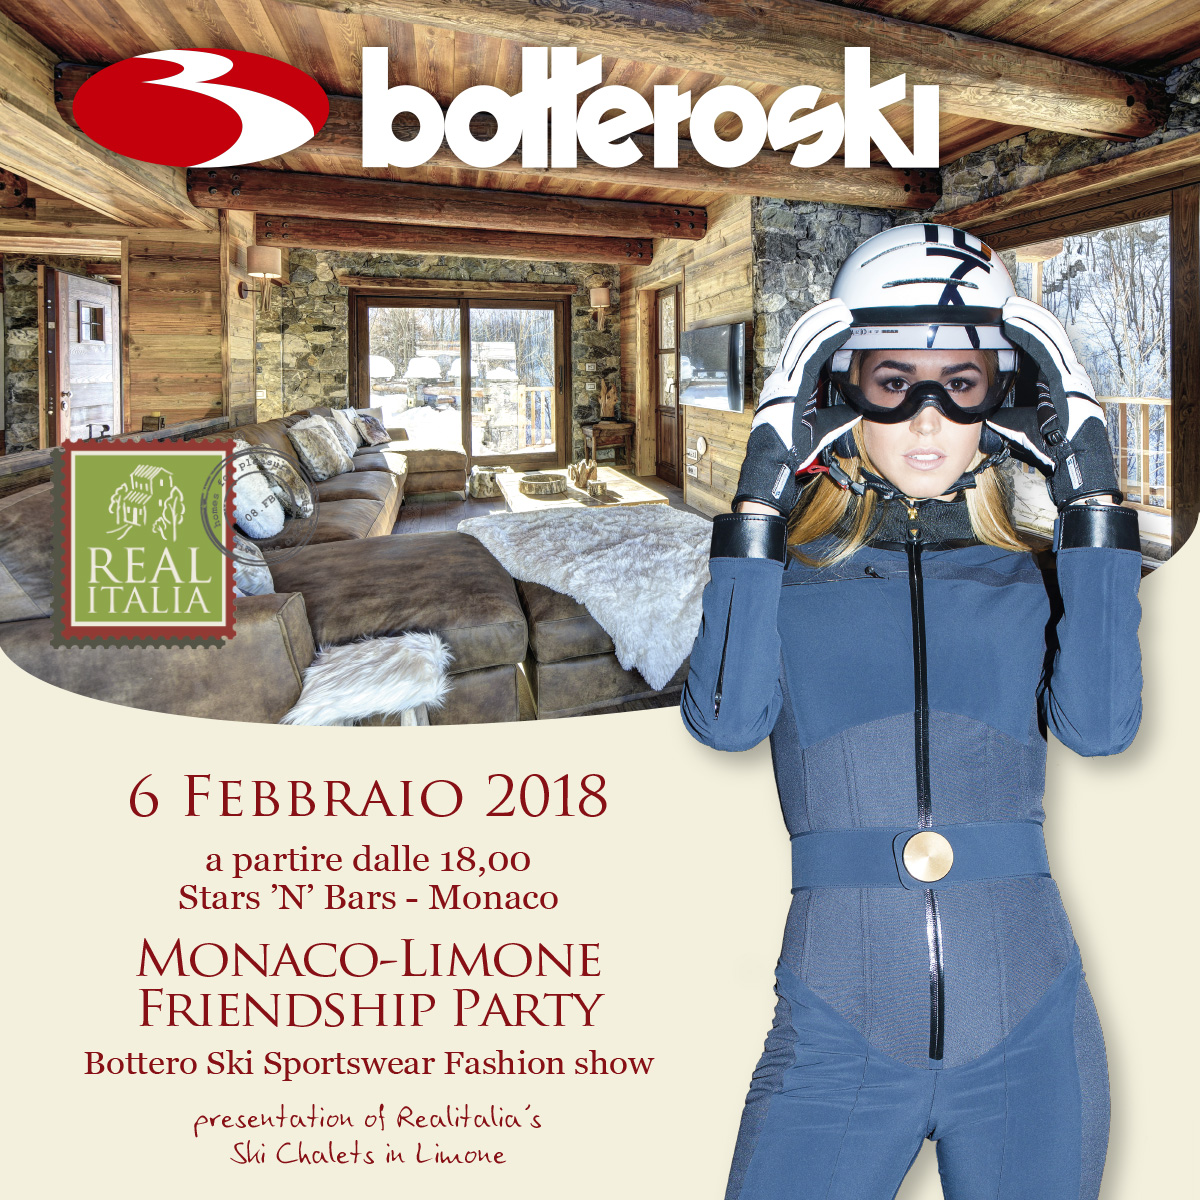 Sfilata Montacarlo Monaco-Limone Friendship 2018